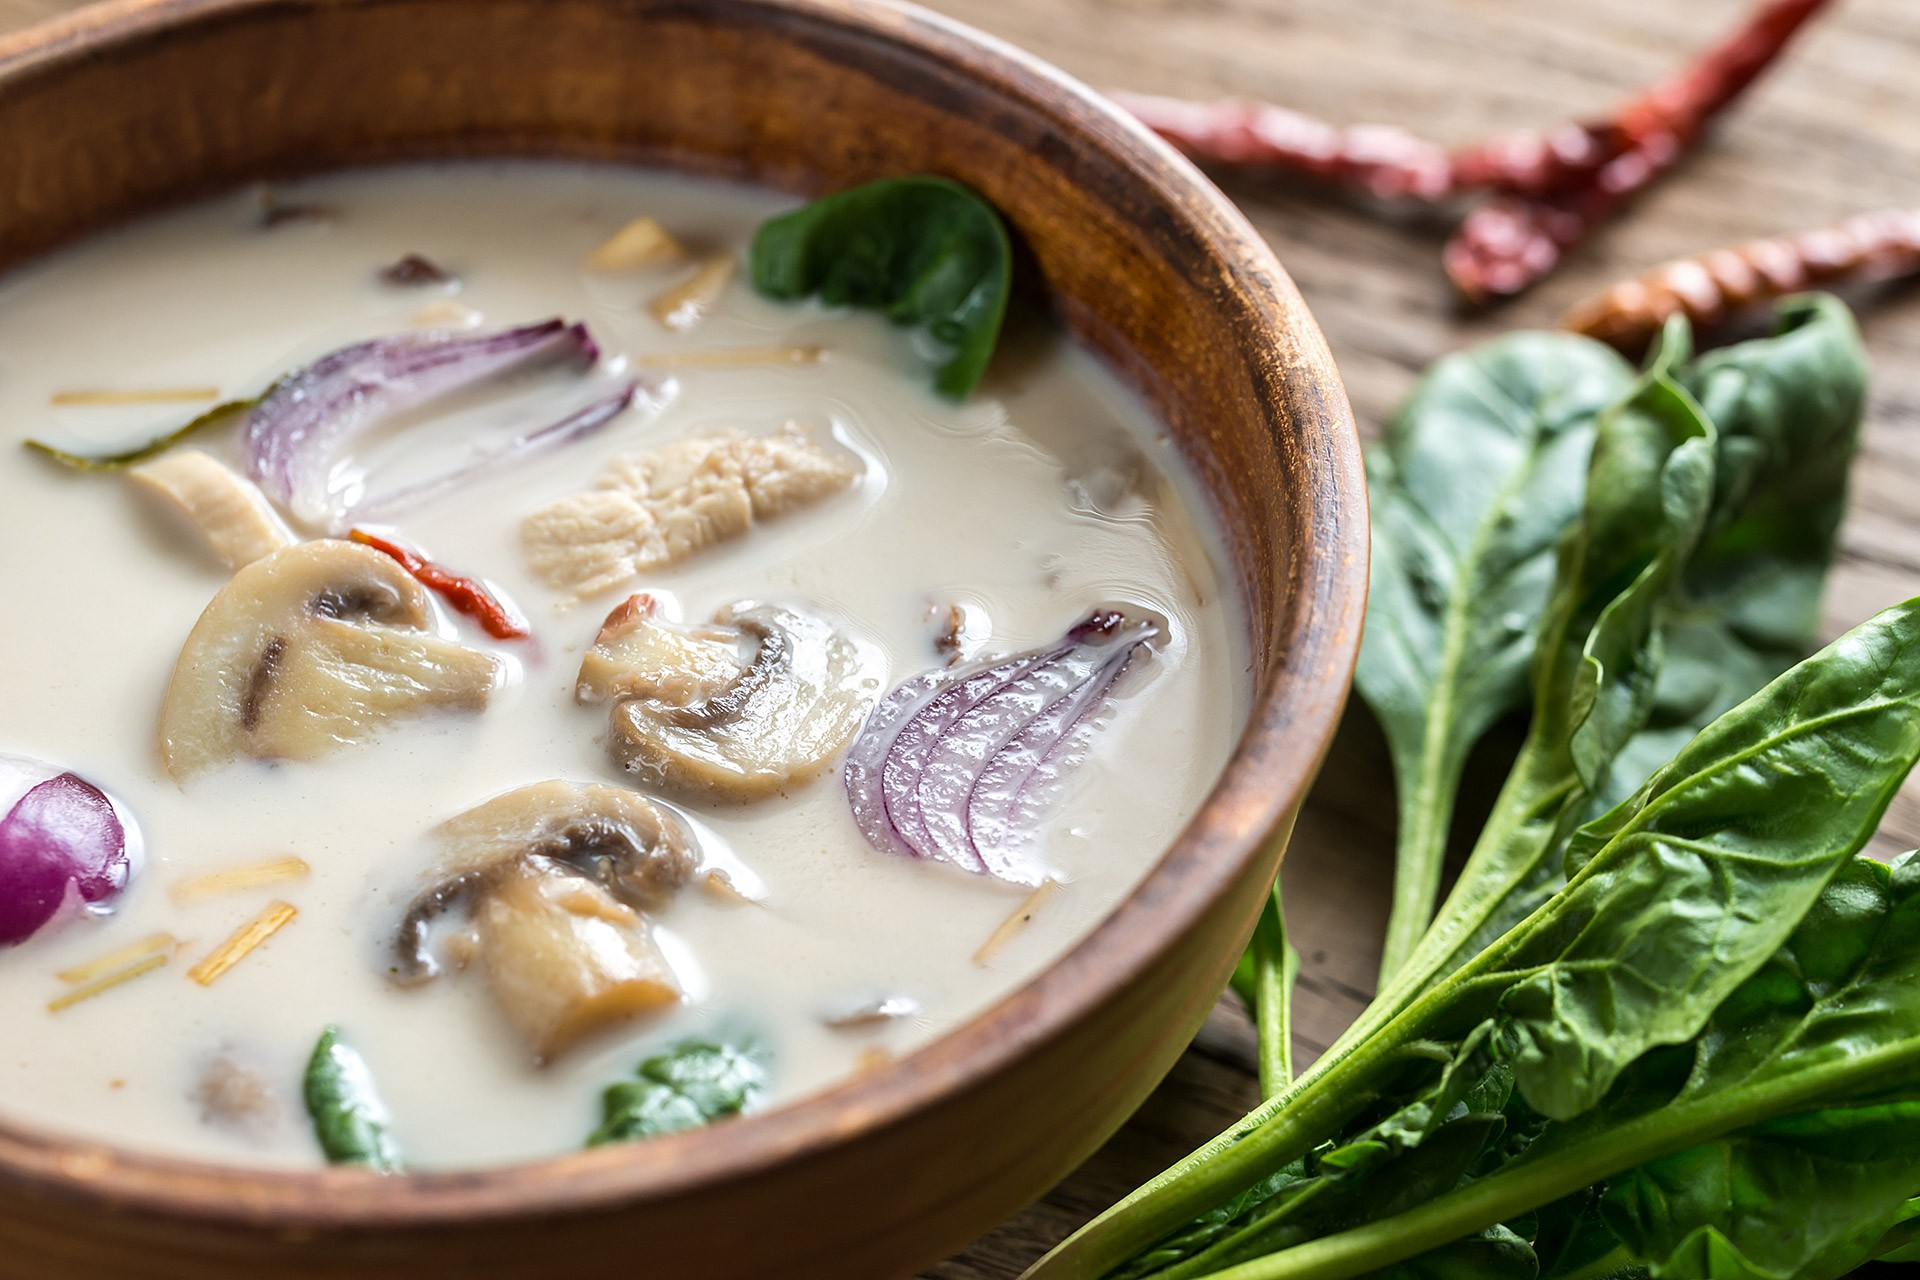 Het beste Thaise take away restaurant in de omgeving van Merksem